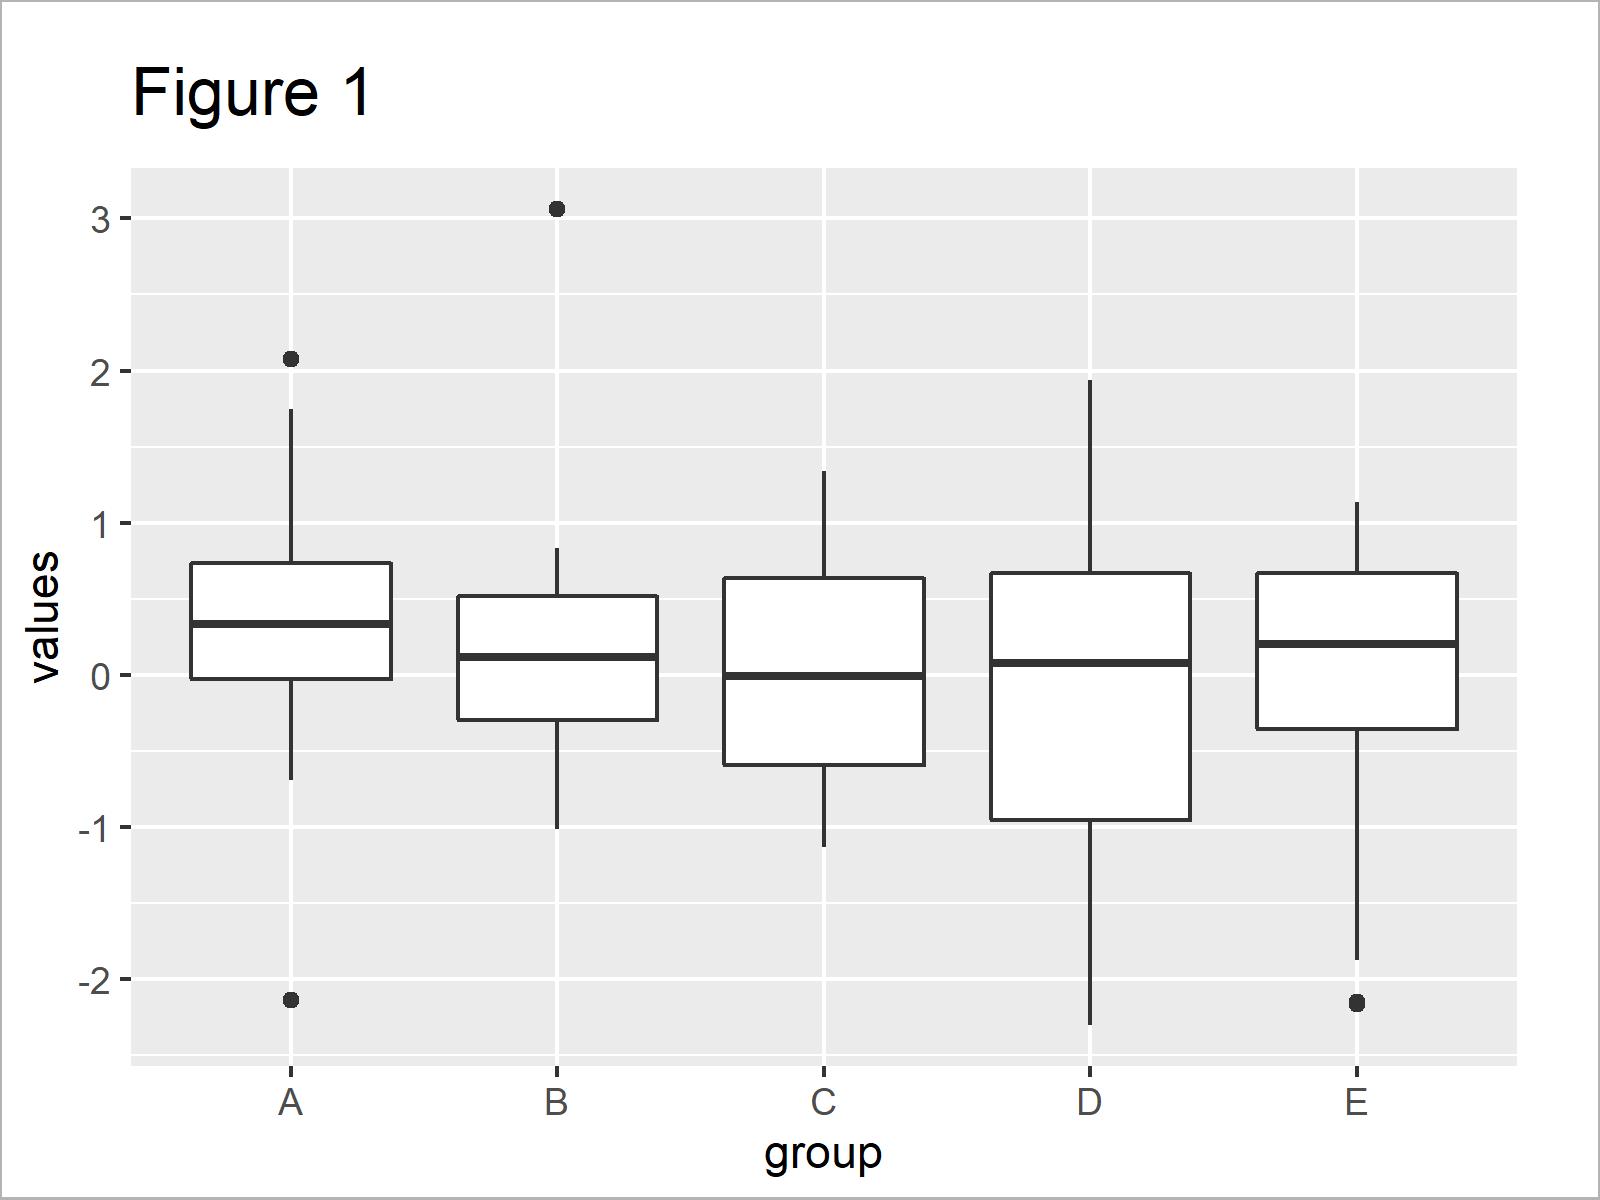 r graph figure 1 overlay ggplot2 boxplot line r